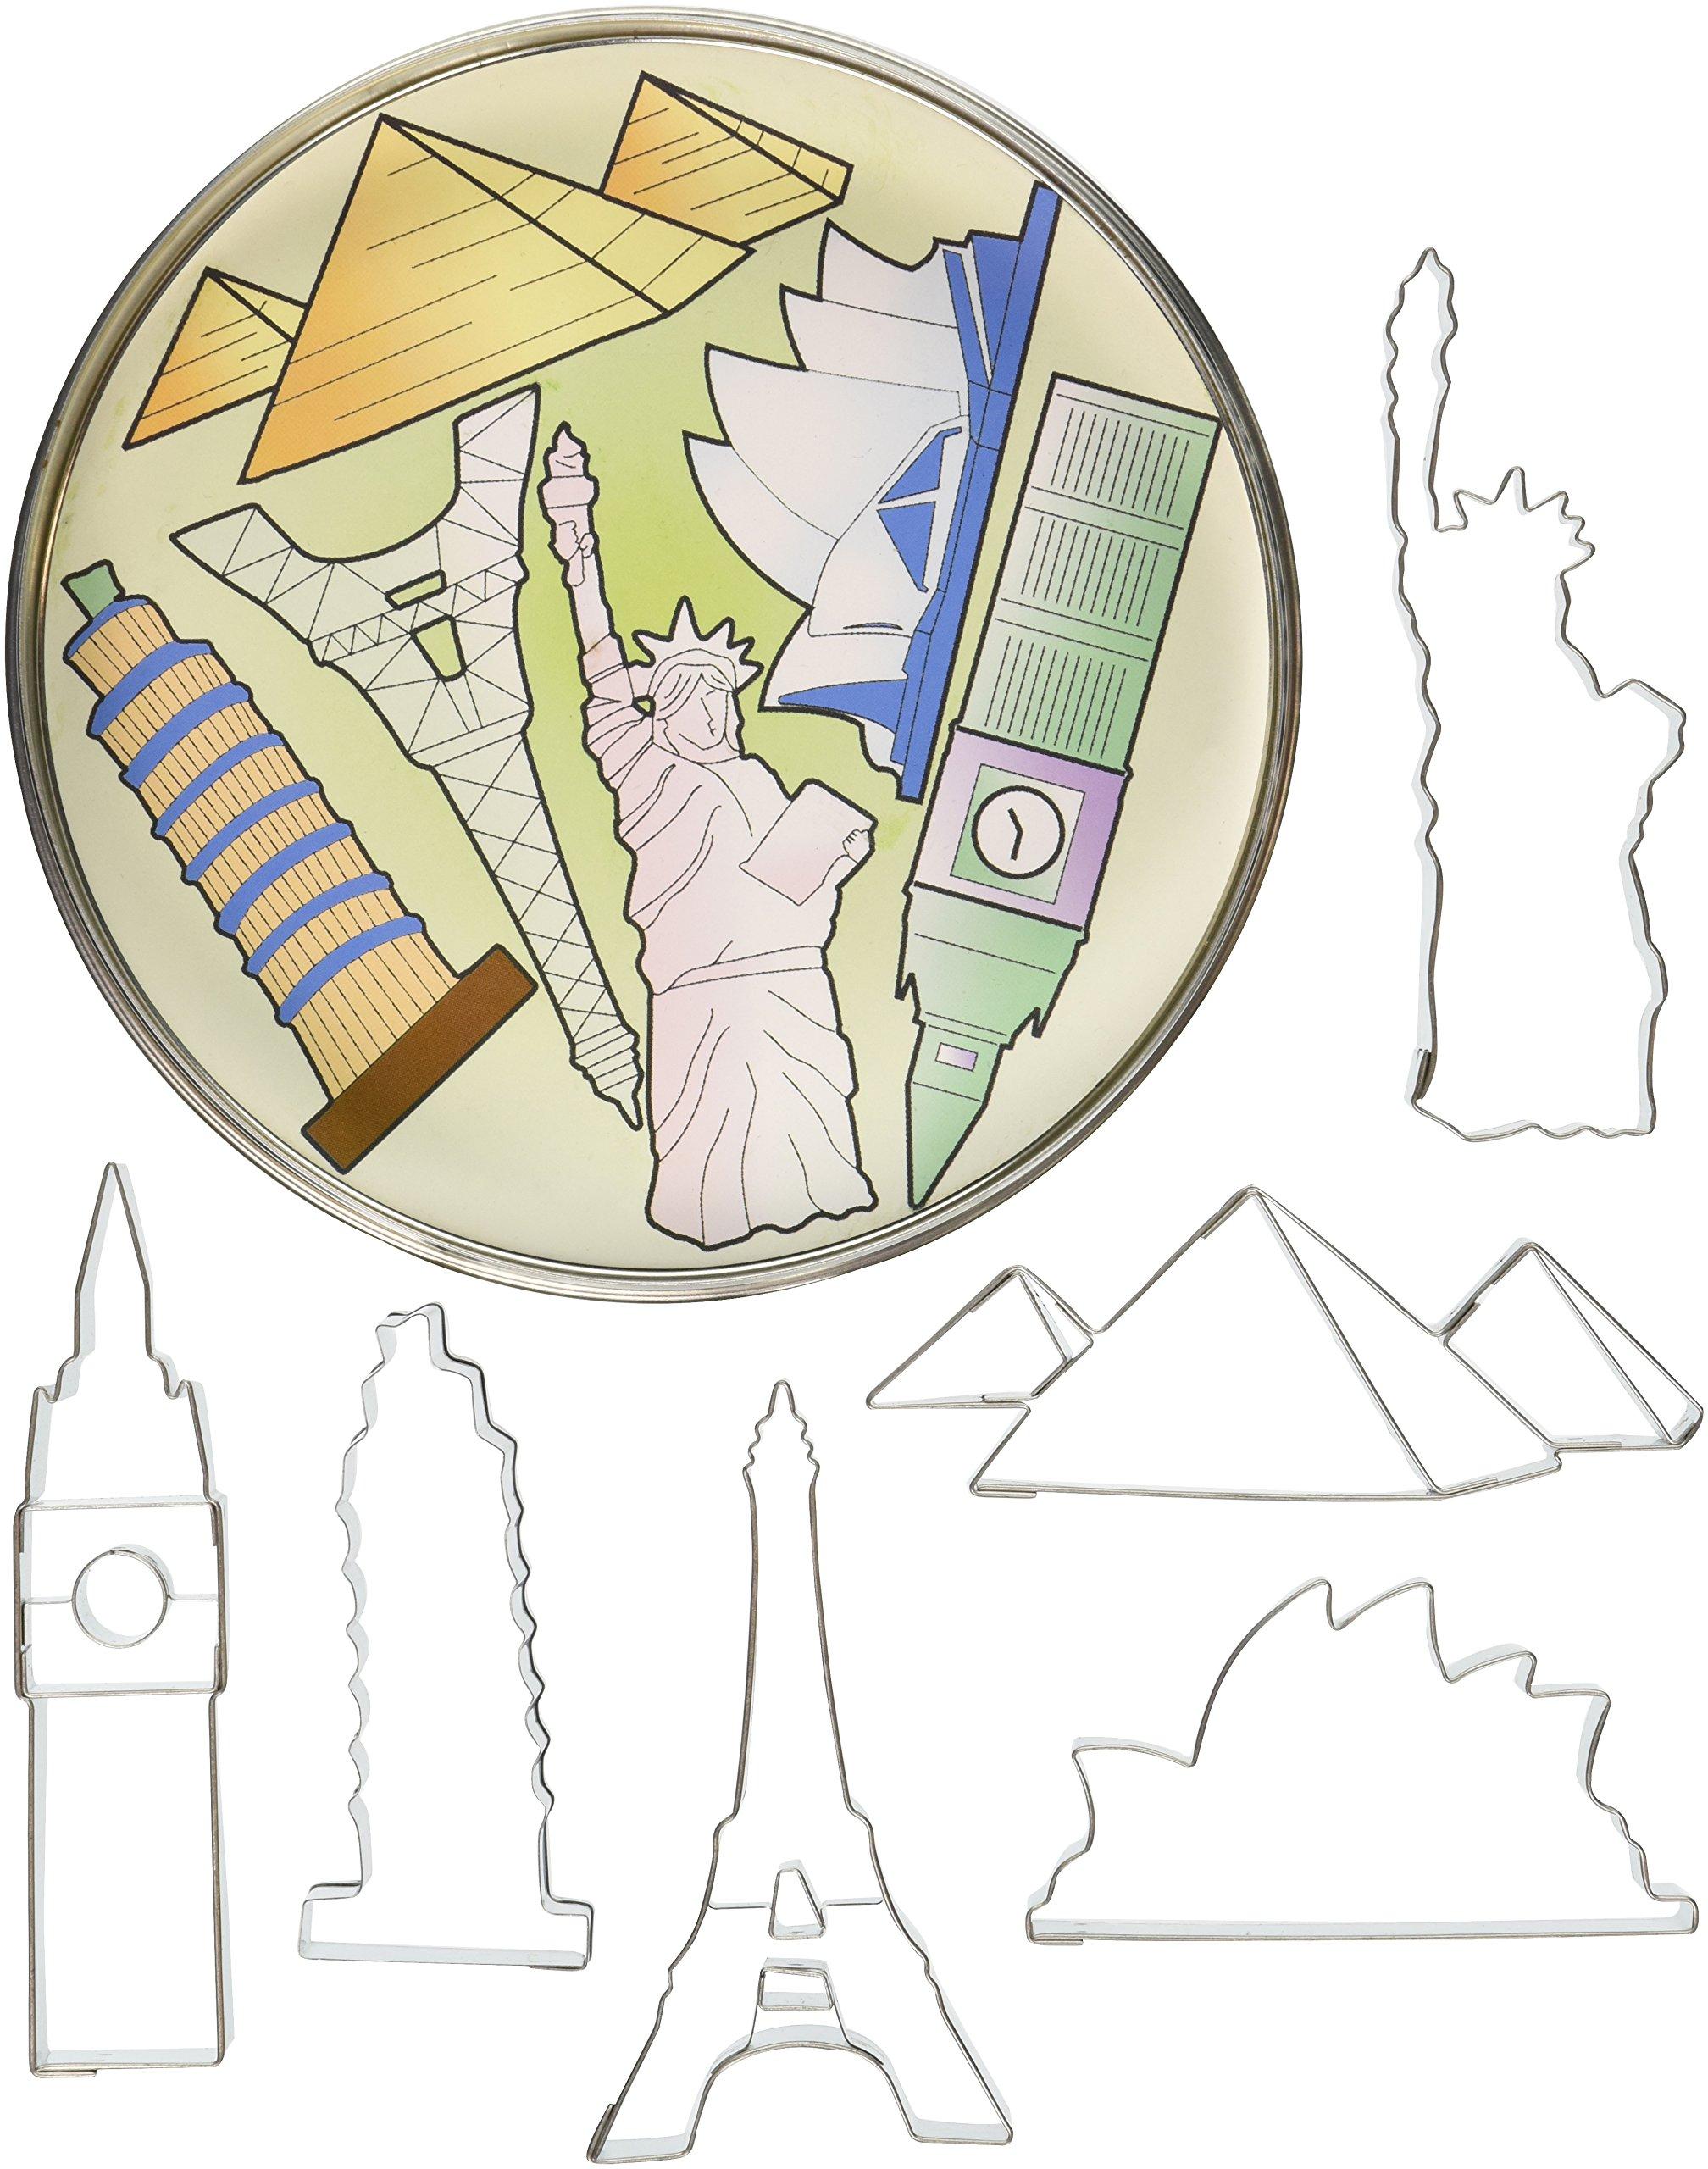 R&M International 1875 Landmarks Cookie Cutters, Big Ben, Sydney Opera House, Statue of Liberty, Pyramid, Eiffel Tower, Tower of Pisa, 6-Piece Set